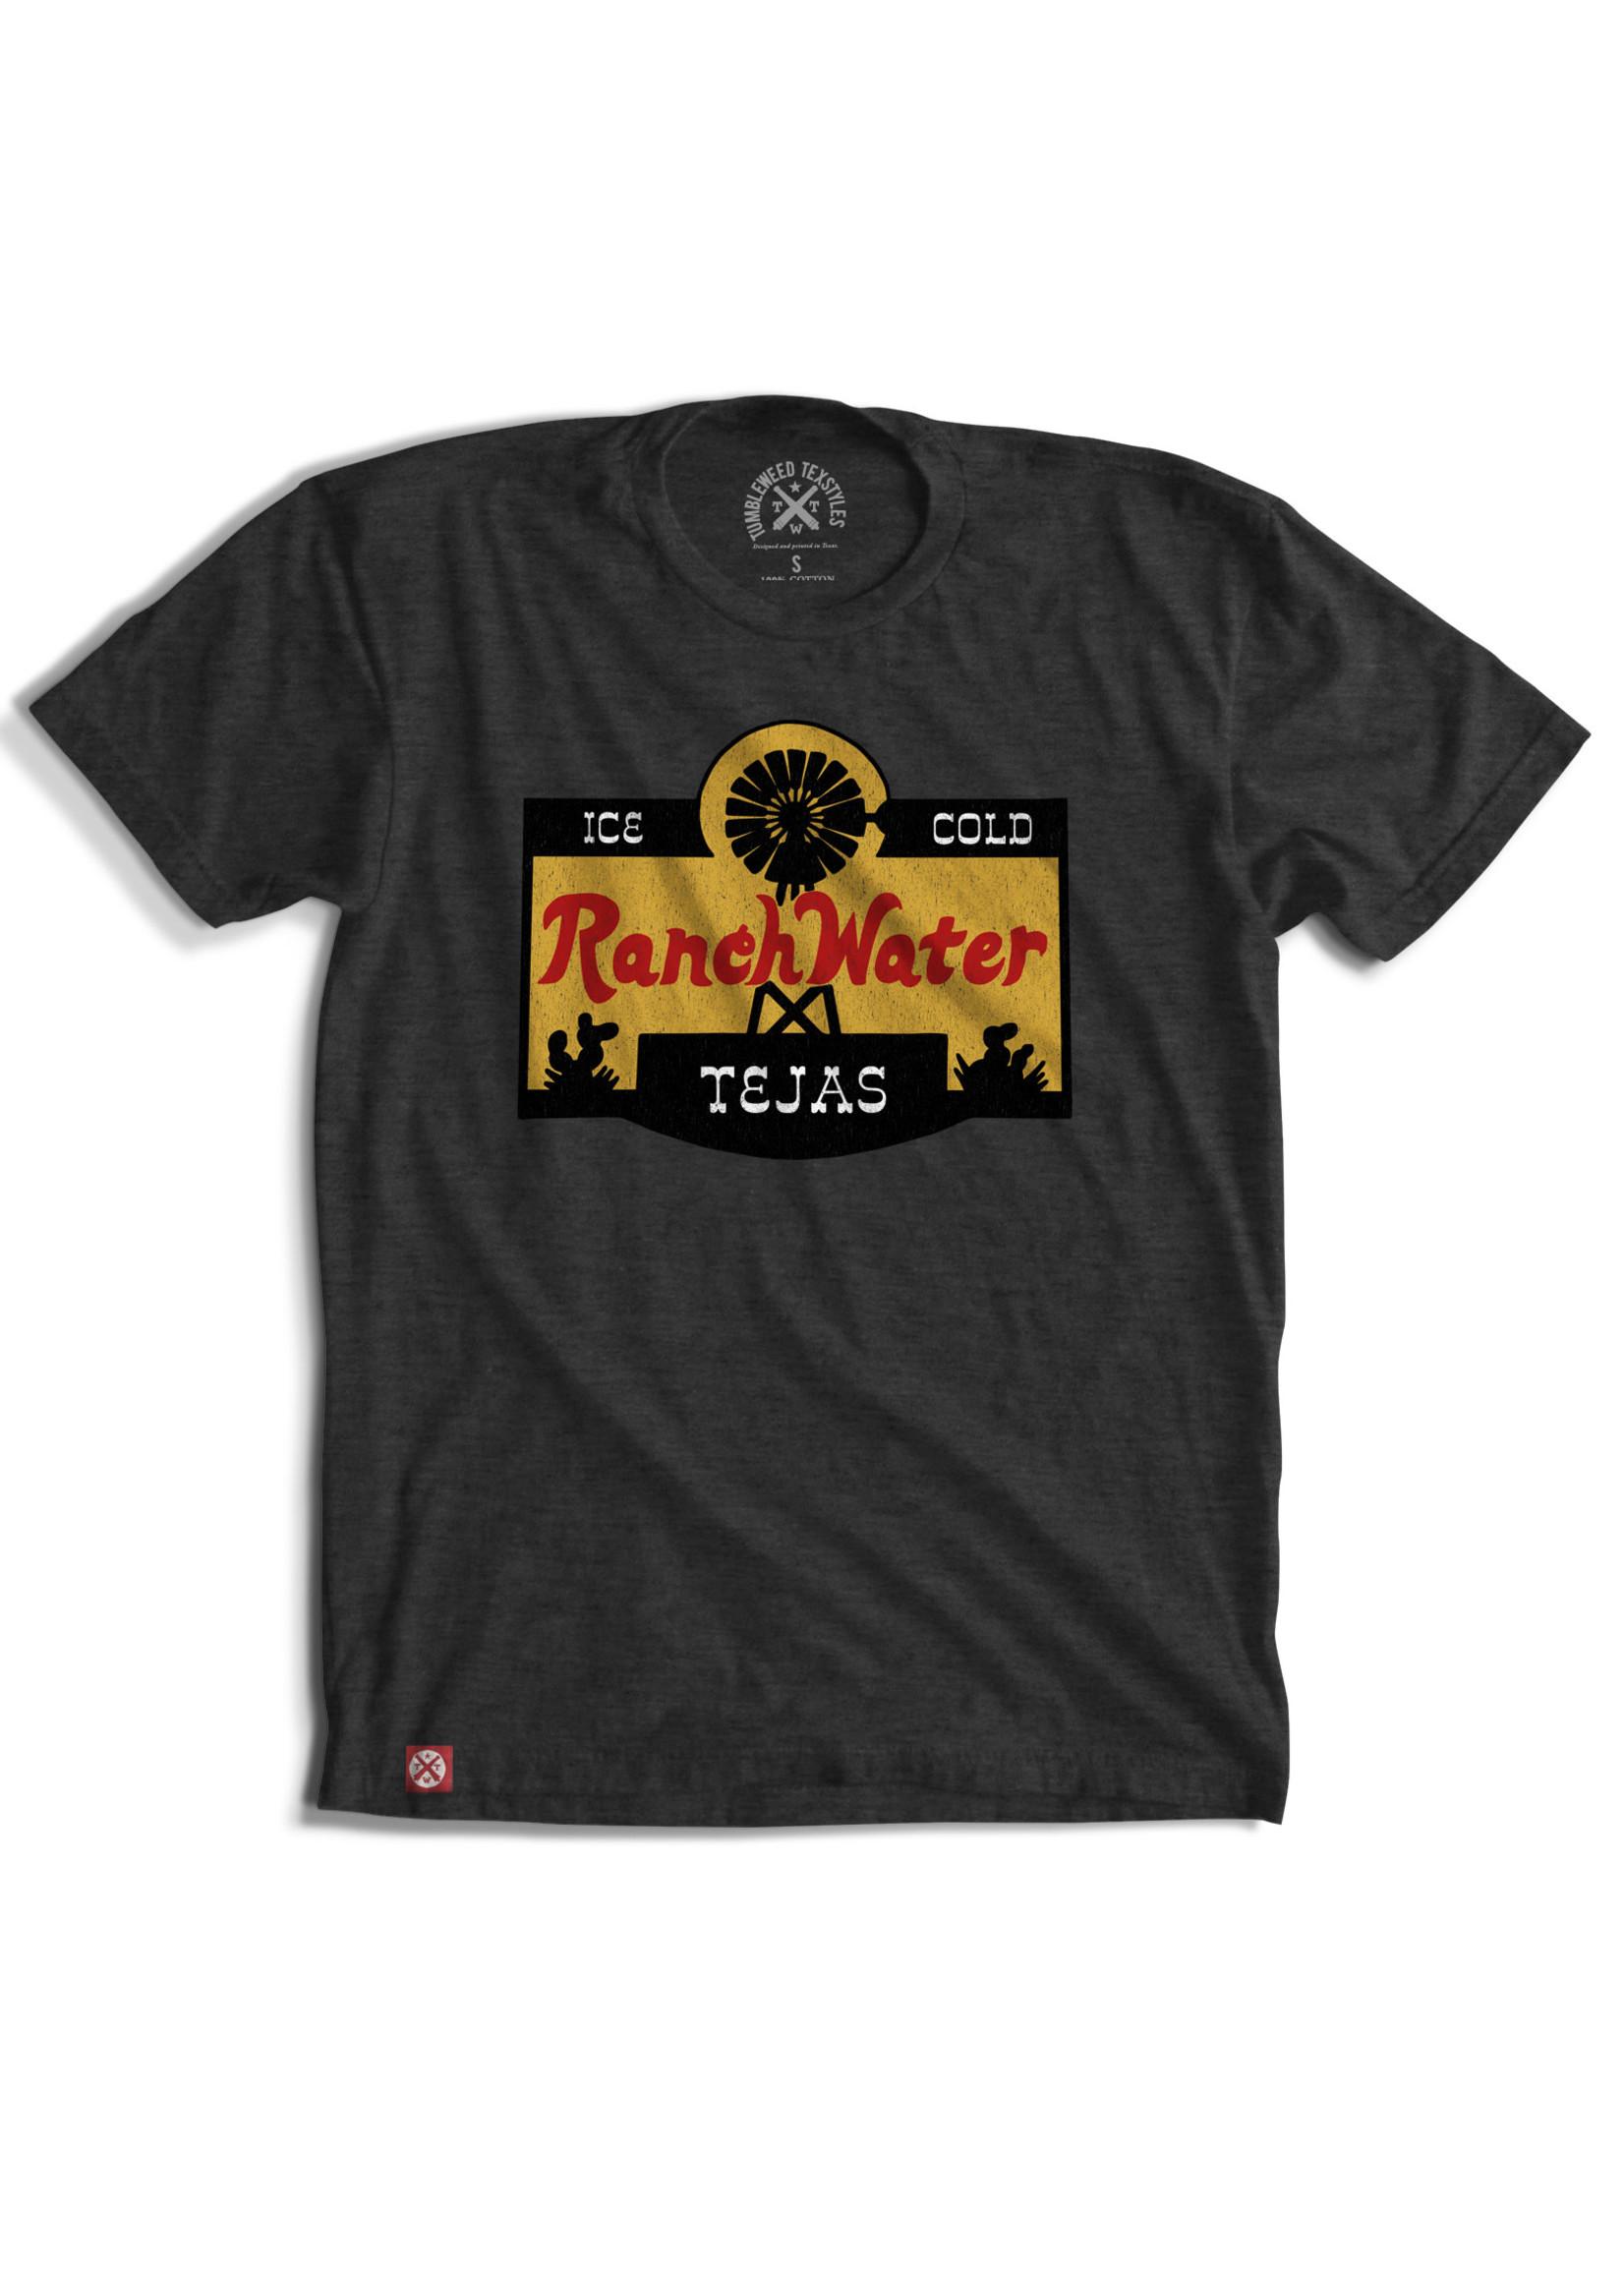 Tumbleweed Texstyles Ranch Water T-Shirt